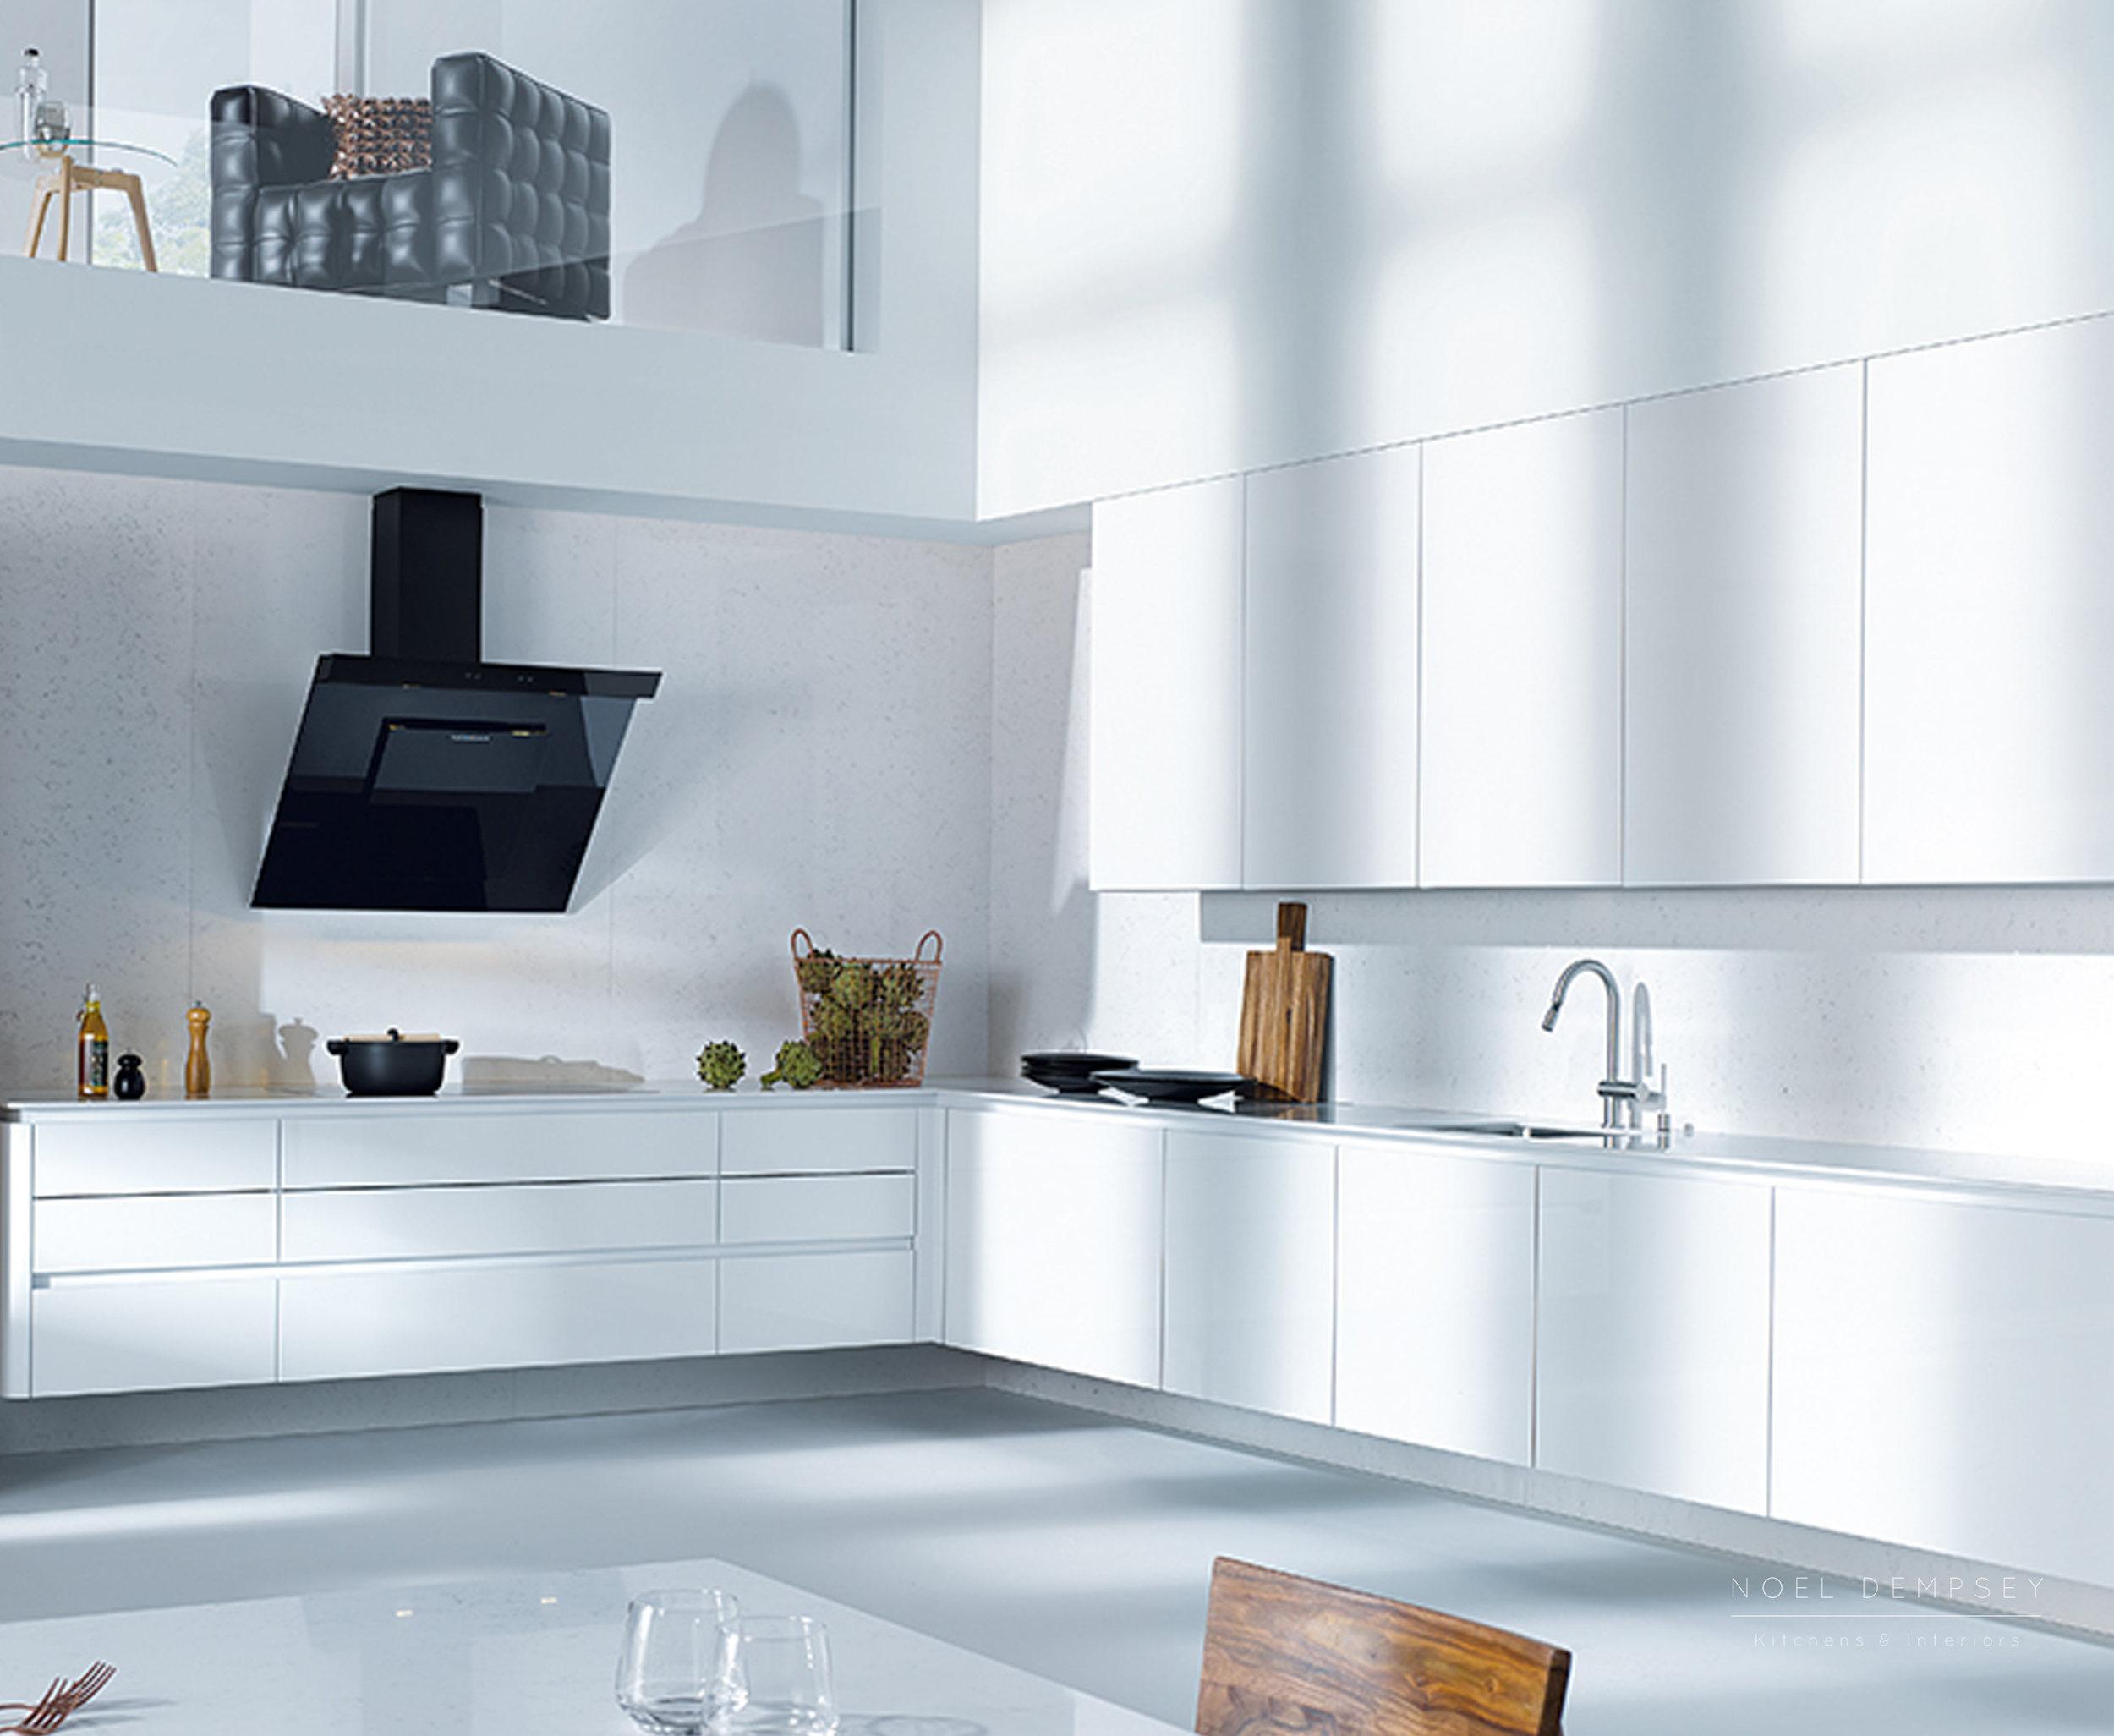 NX501-Crystal-White-Gloss-German-Kitchen-4.jpg